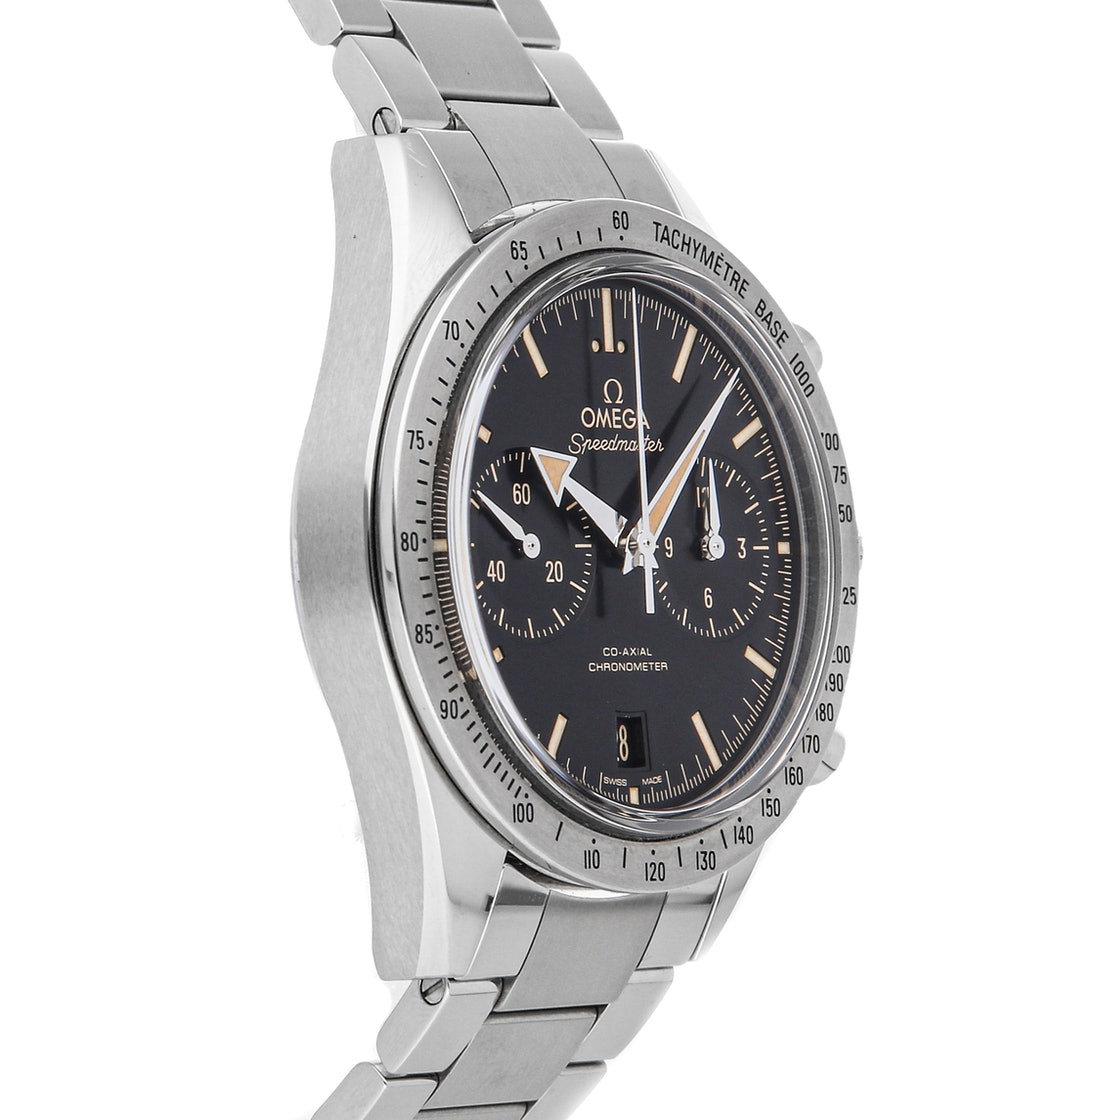 Omega Speedmaster '57 Chronograph 331.10.42.51.01.002